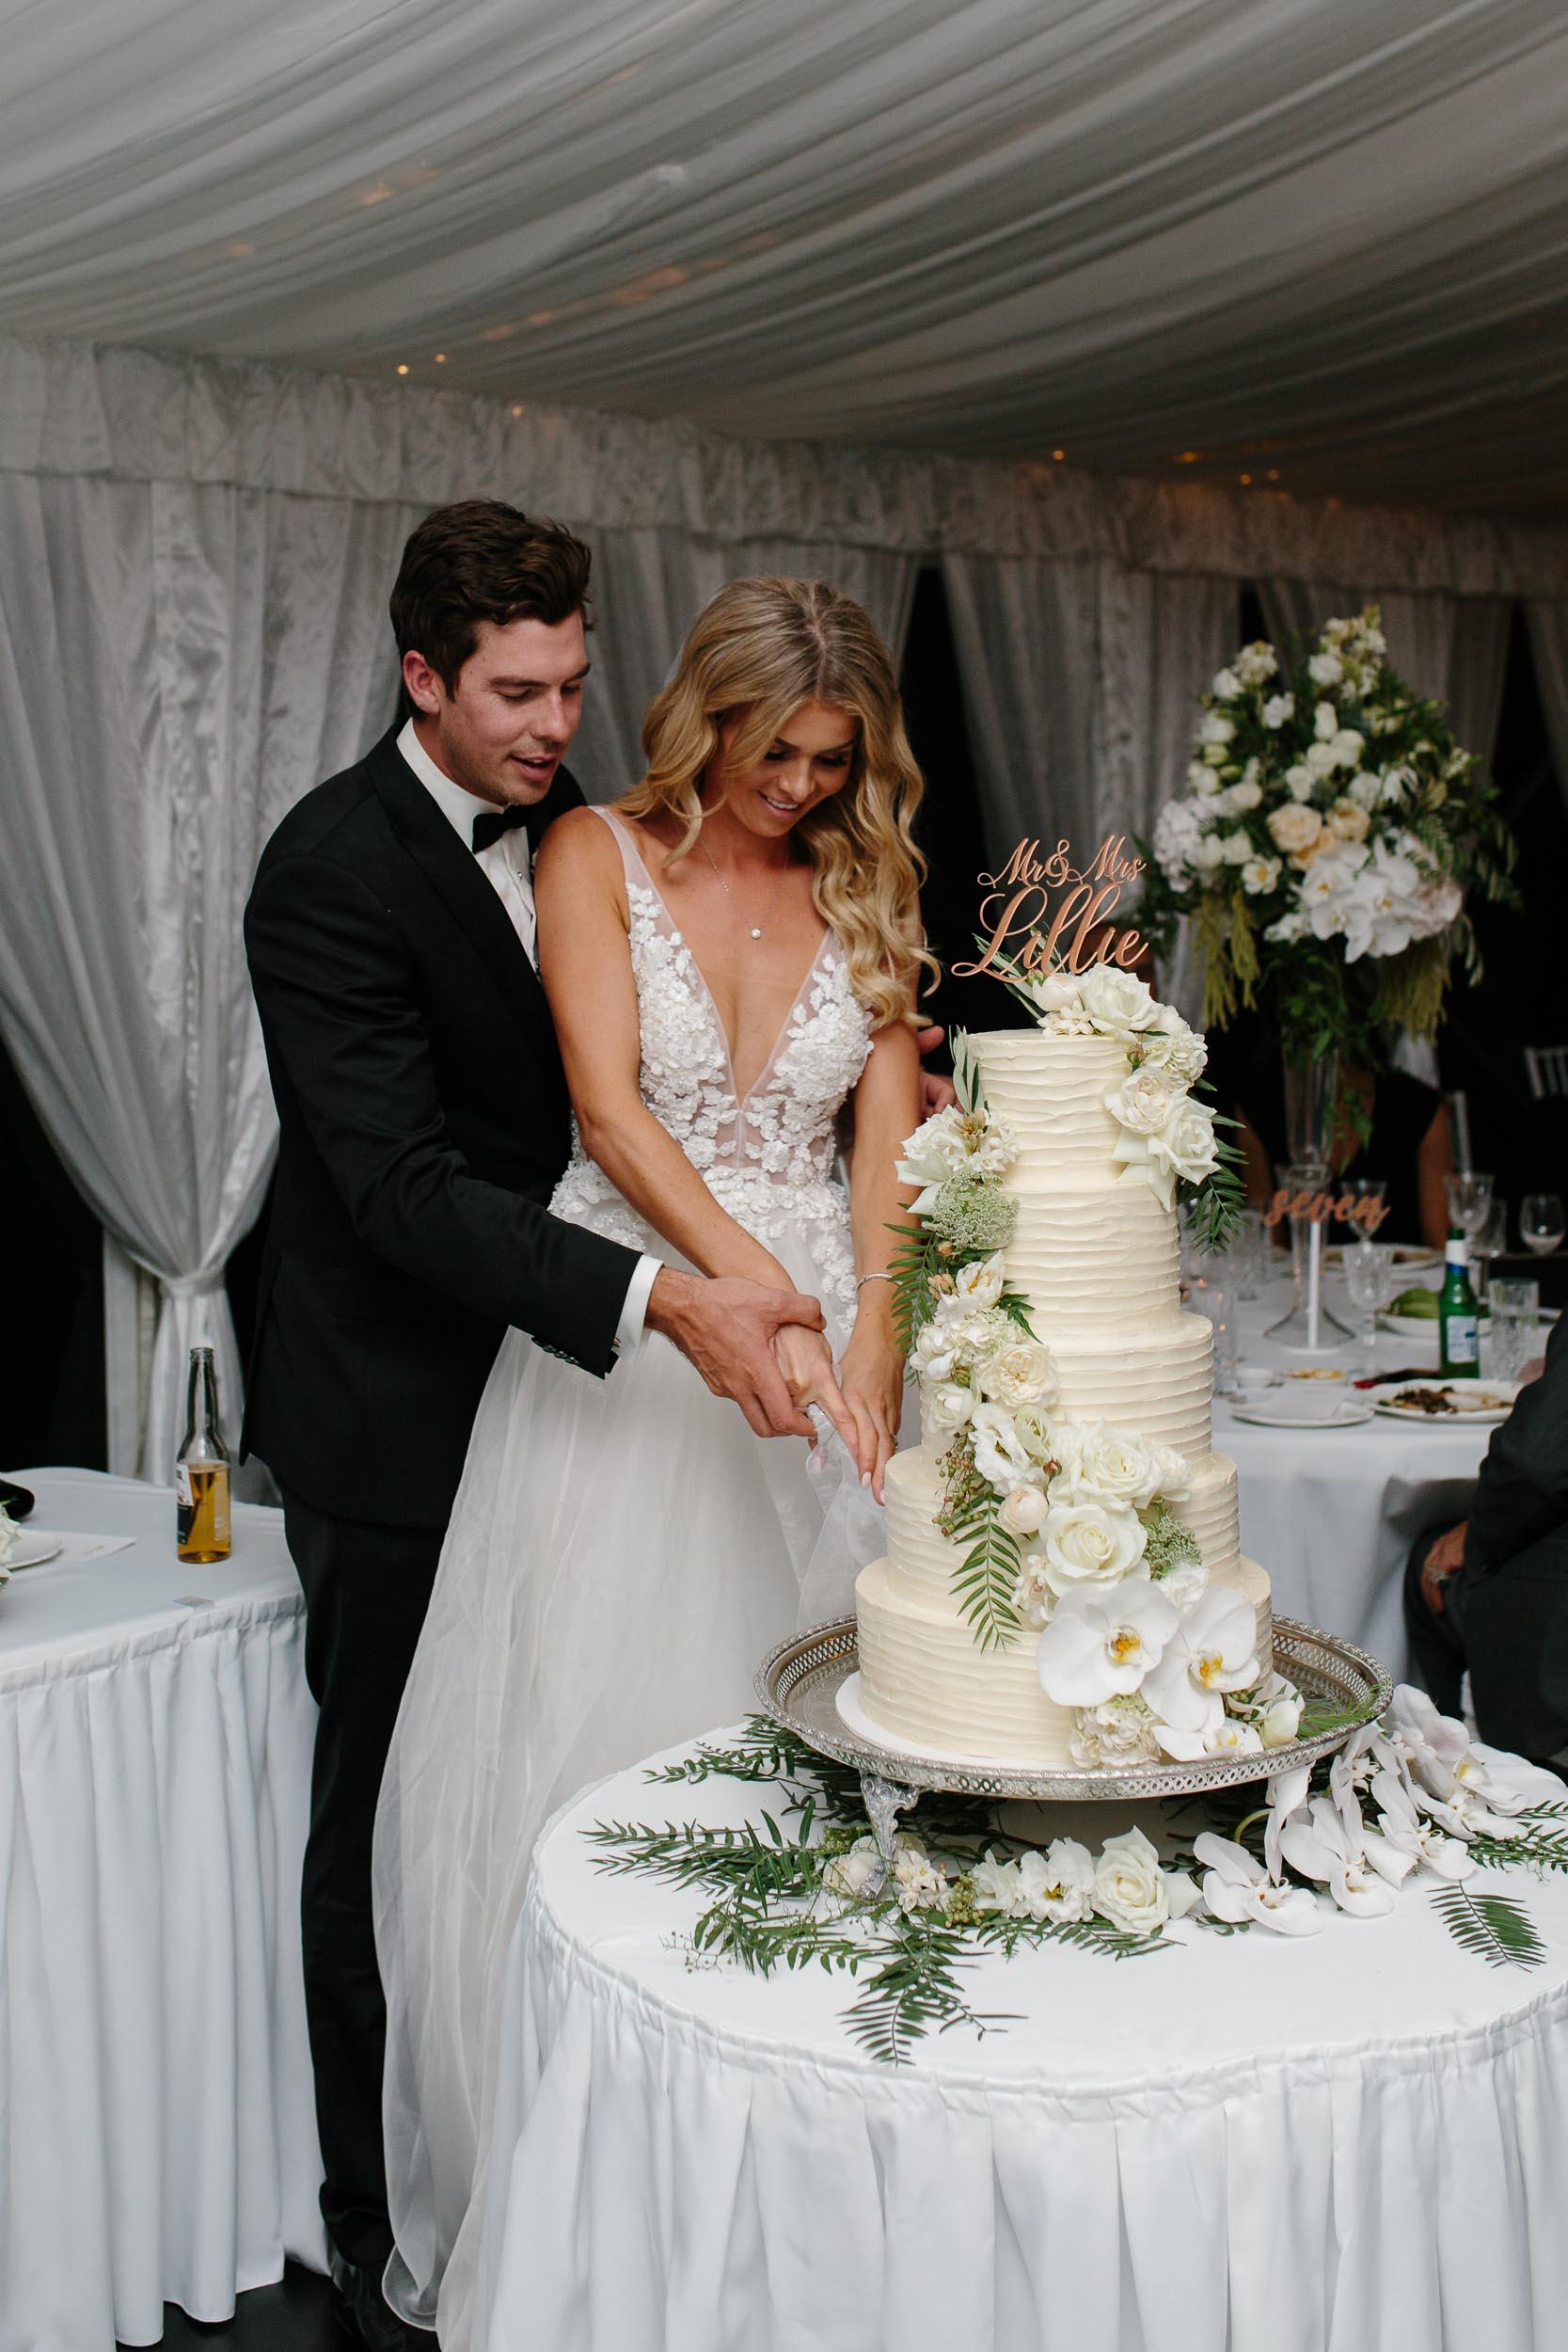 Kas-Richards-Mornington-Peninsula-Private-Property-Wedding-Marianna-Hardwick-Gown-784.jpg